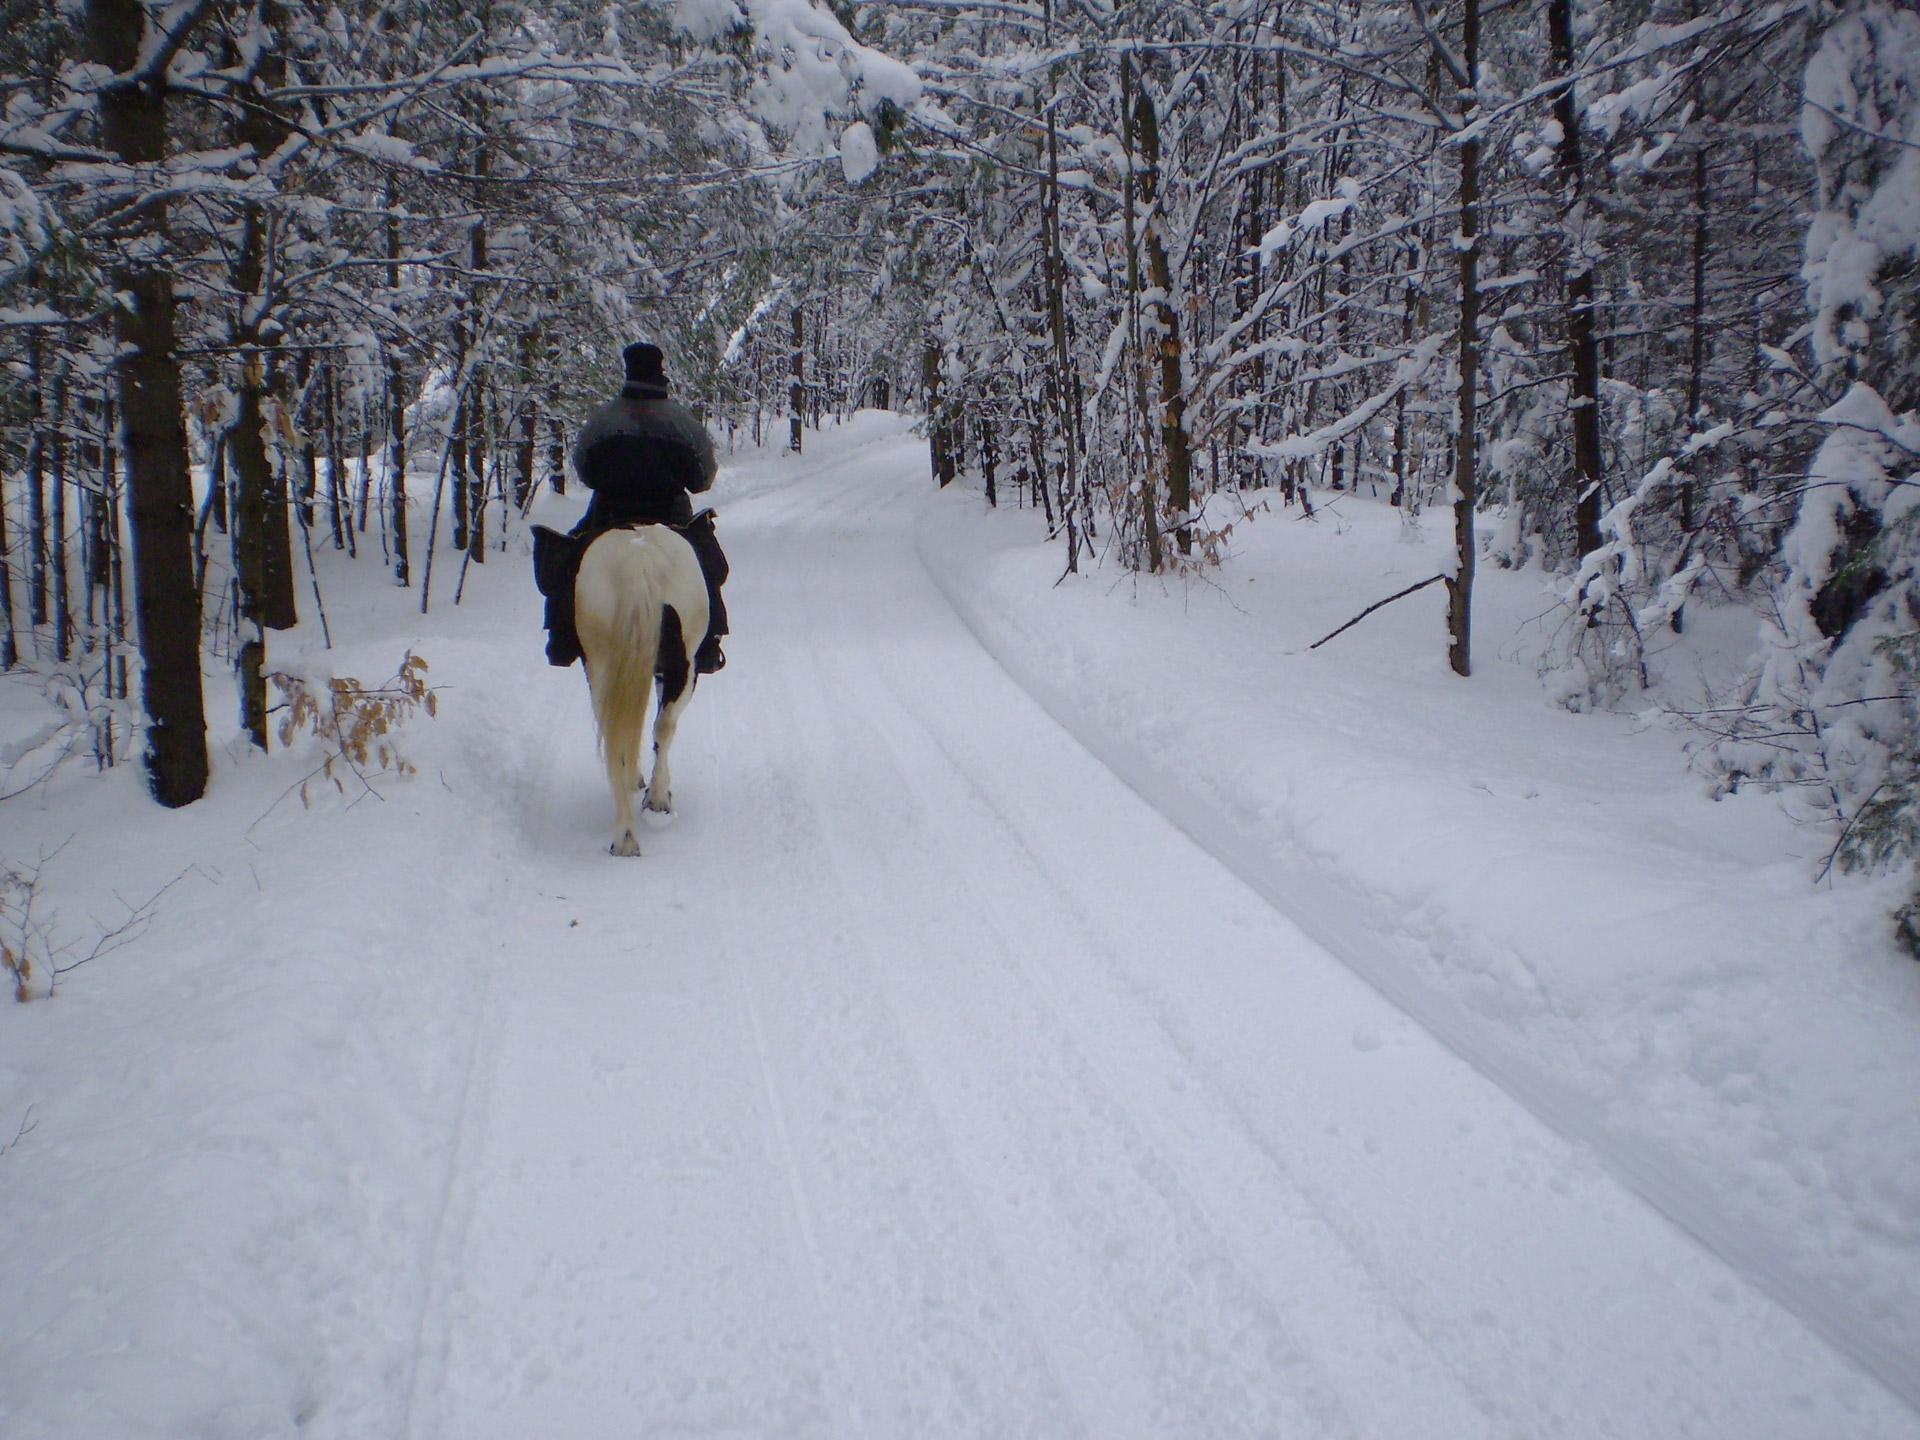 person riding a horse through the snow during winter